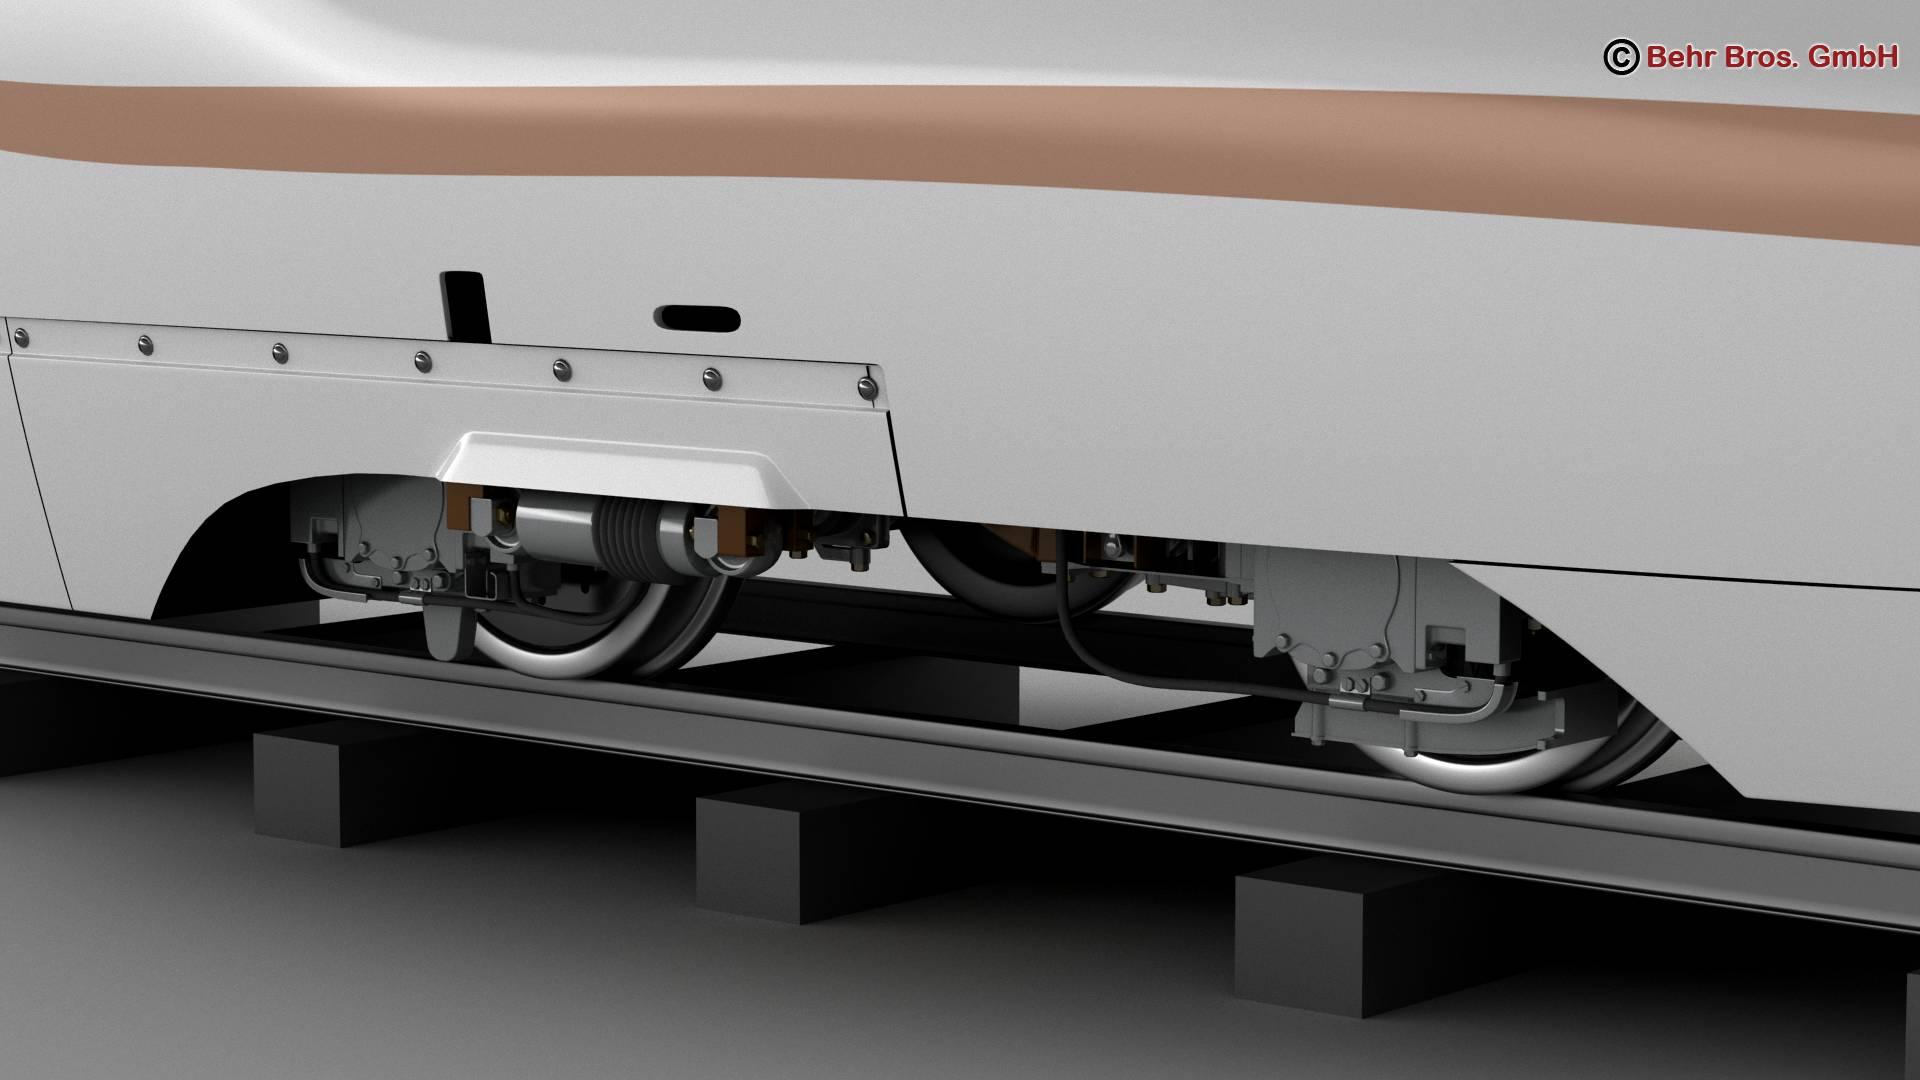 shinkansen e7 3d model 3ds max fbx c4d lwo ma mb obj 265646